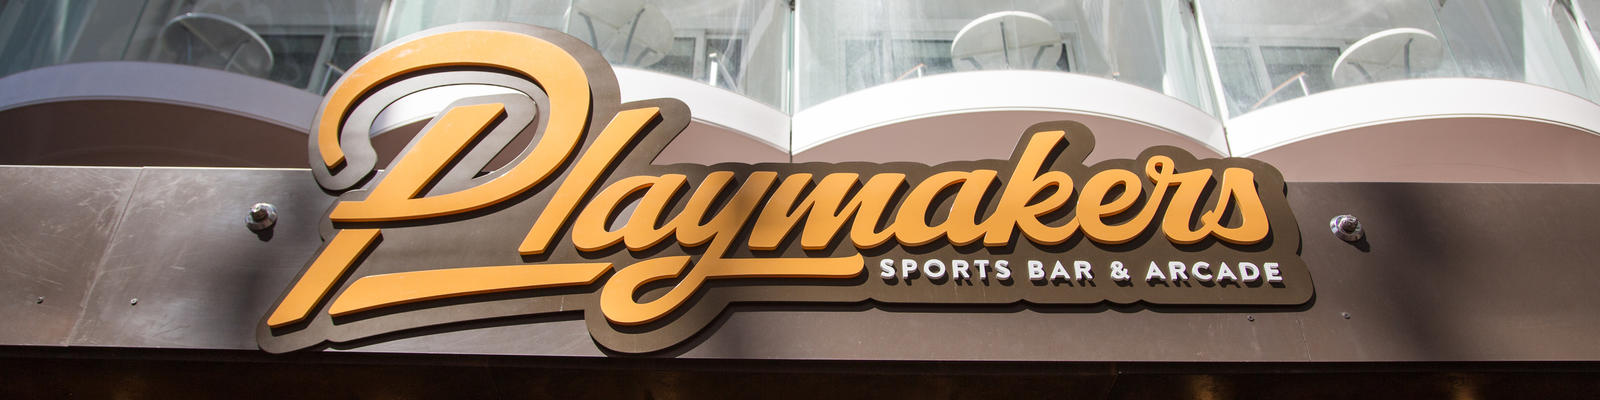 Playmakers Sports Bar on Royal Caribbean's Symphony of the Seas (Photo: Royal Caribbean)